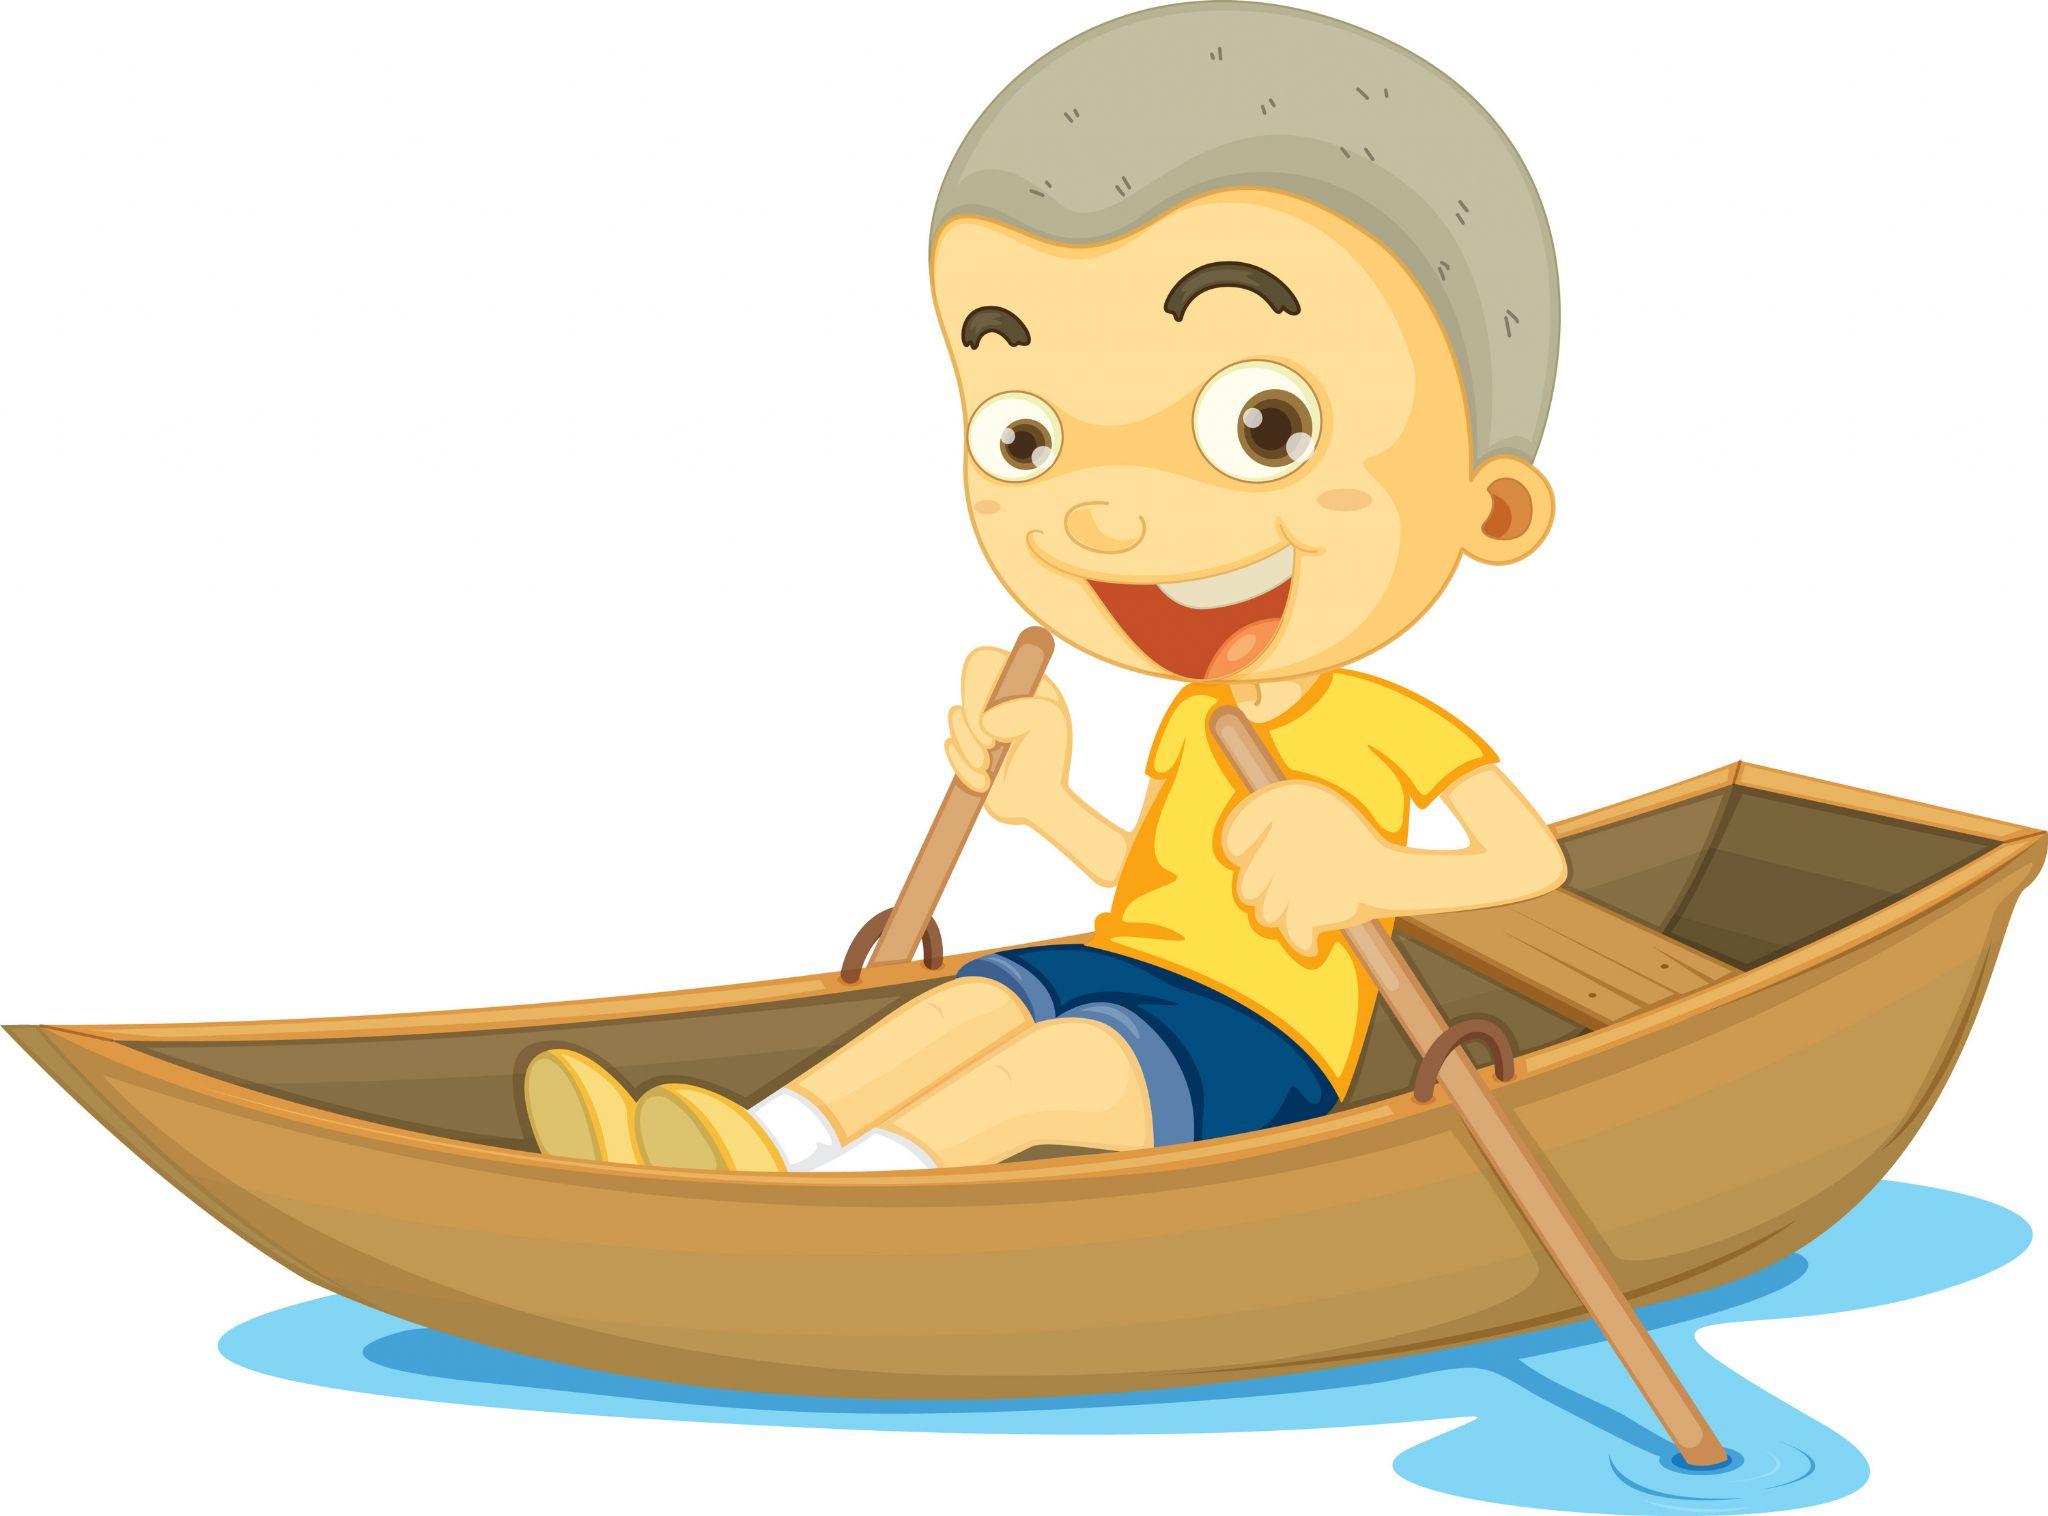 Row row row ya boat.